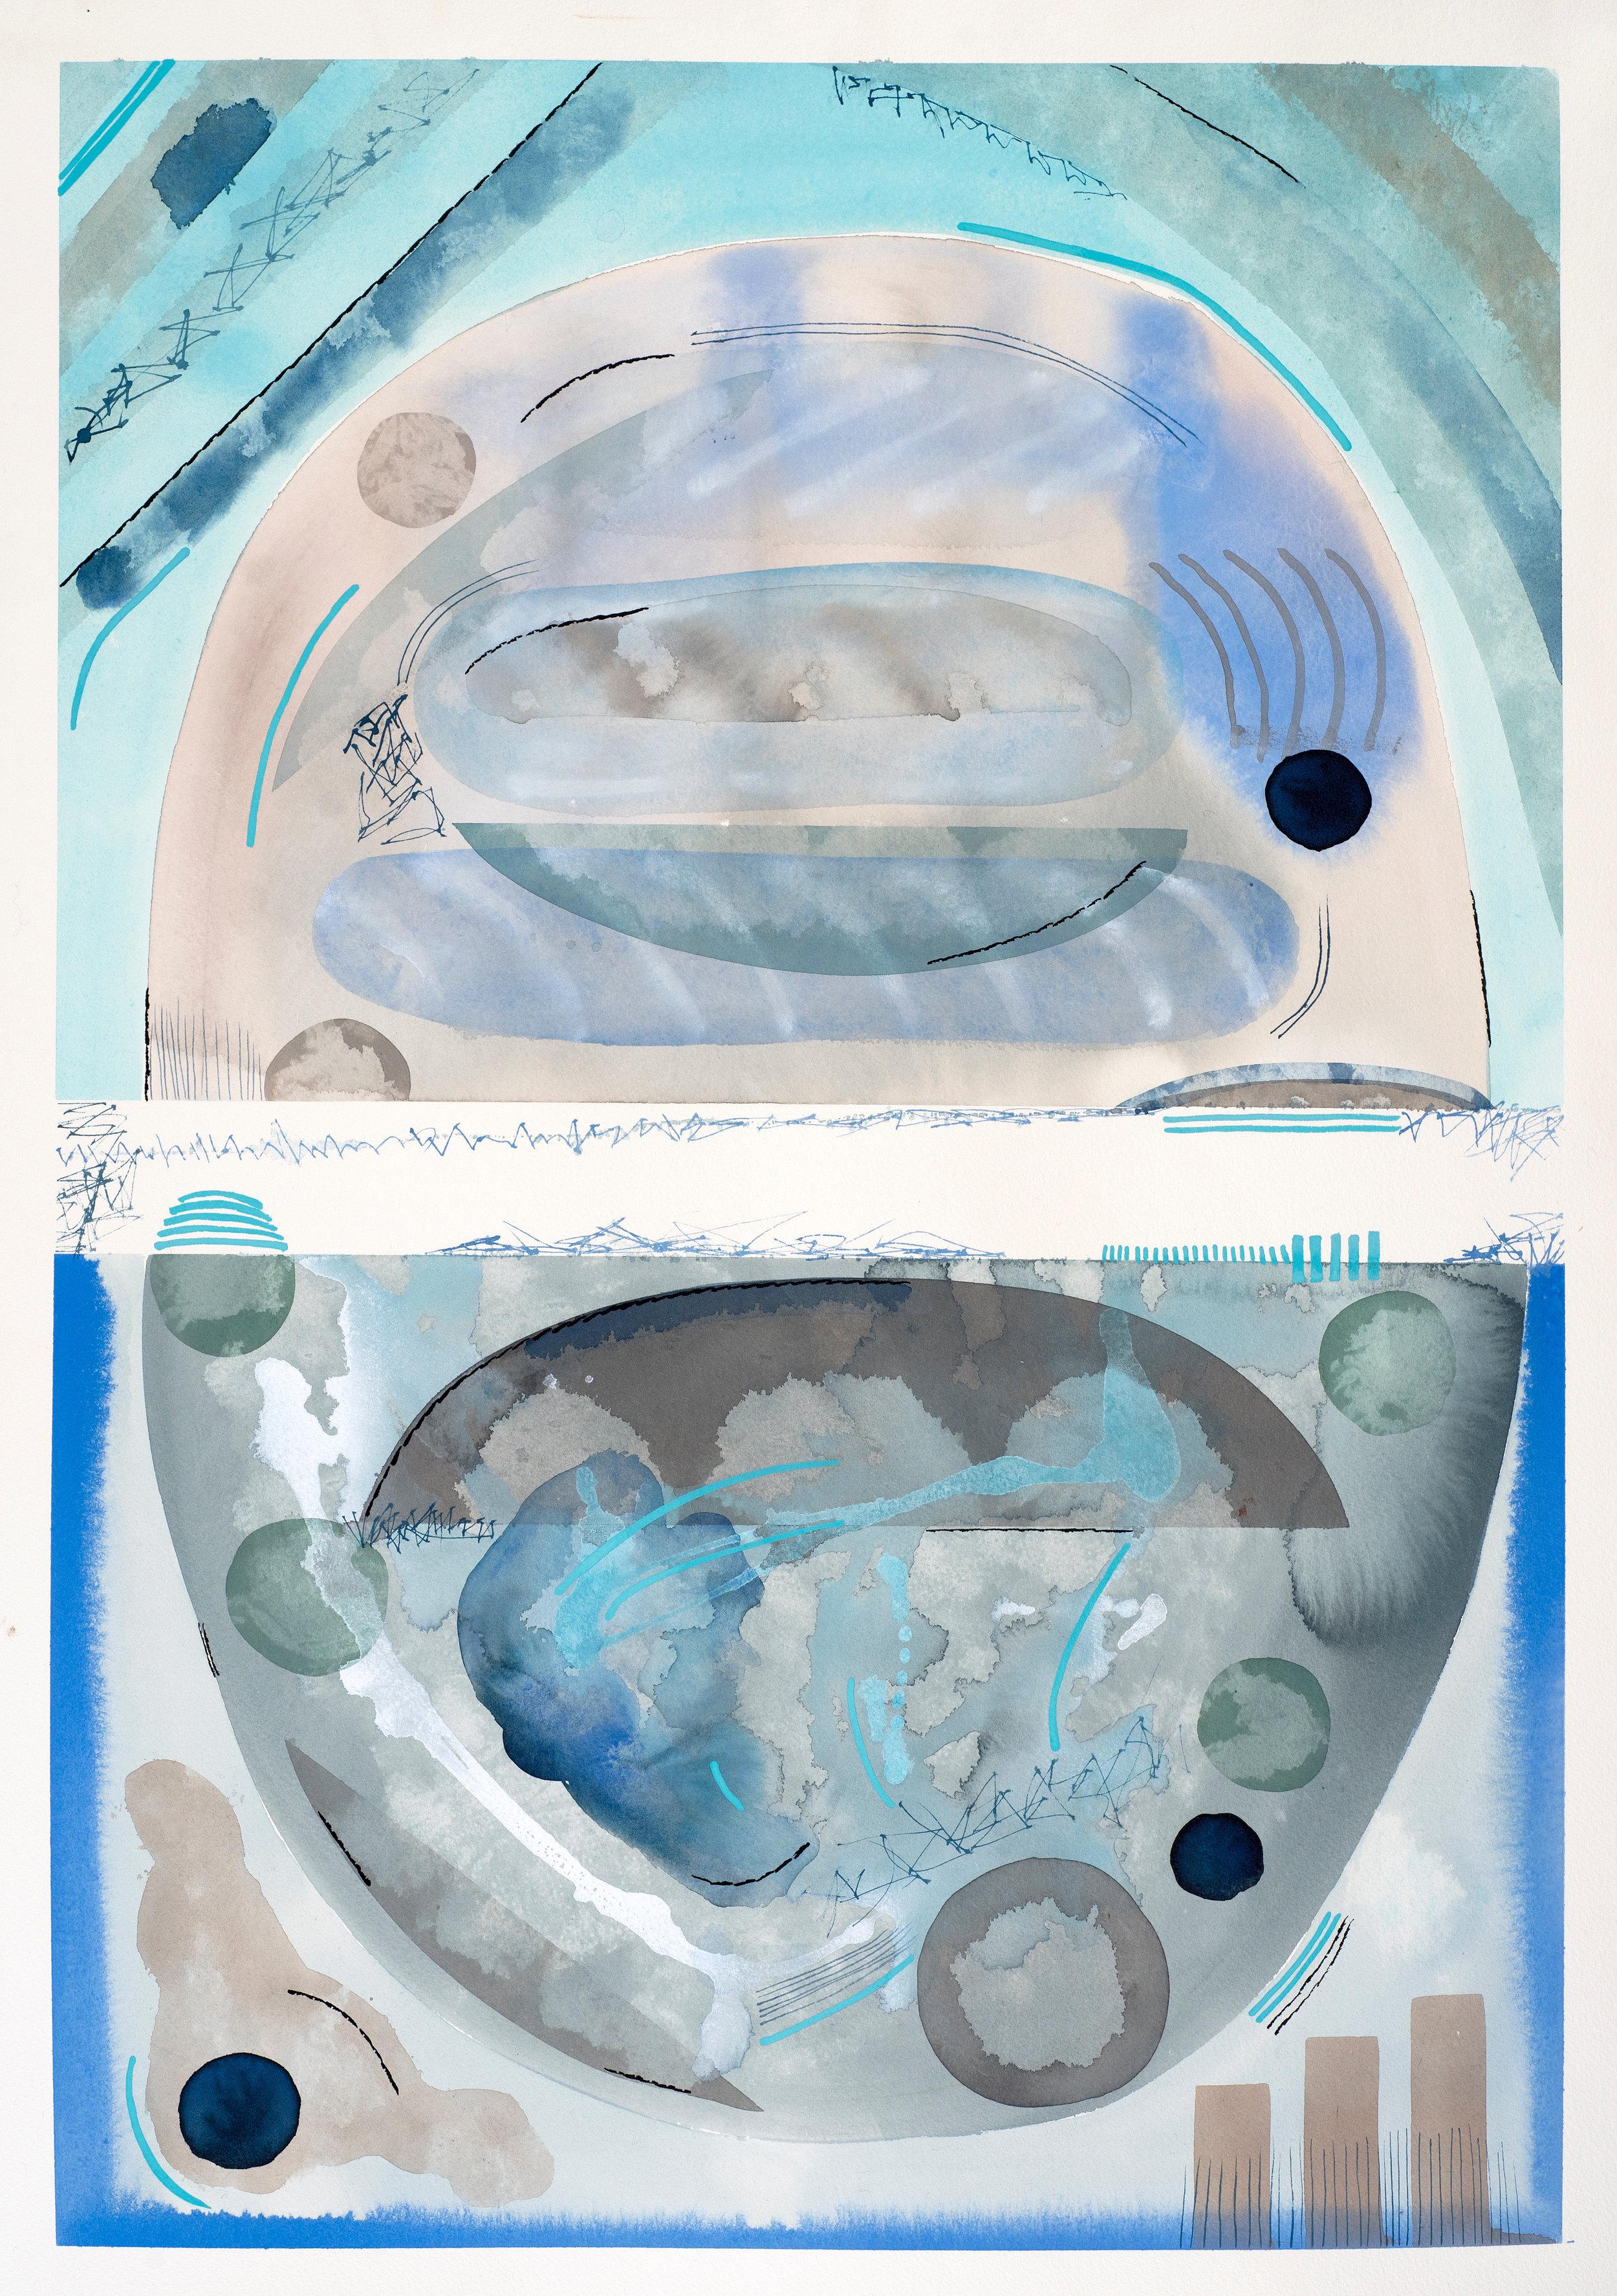 Contemplations 7, all the blues, gouache on paper, 83, 2019, 70 x 48.5 cm